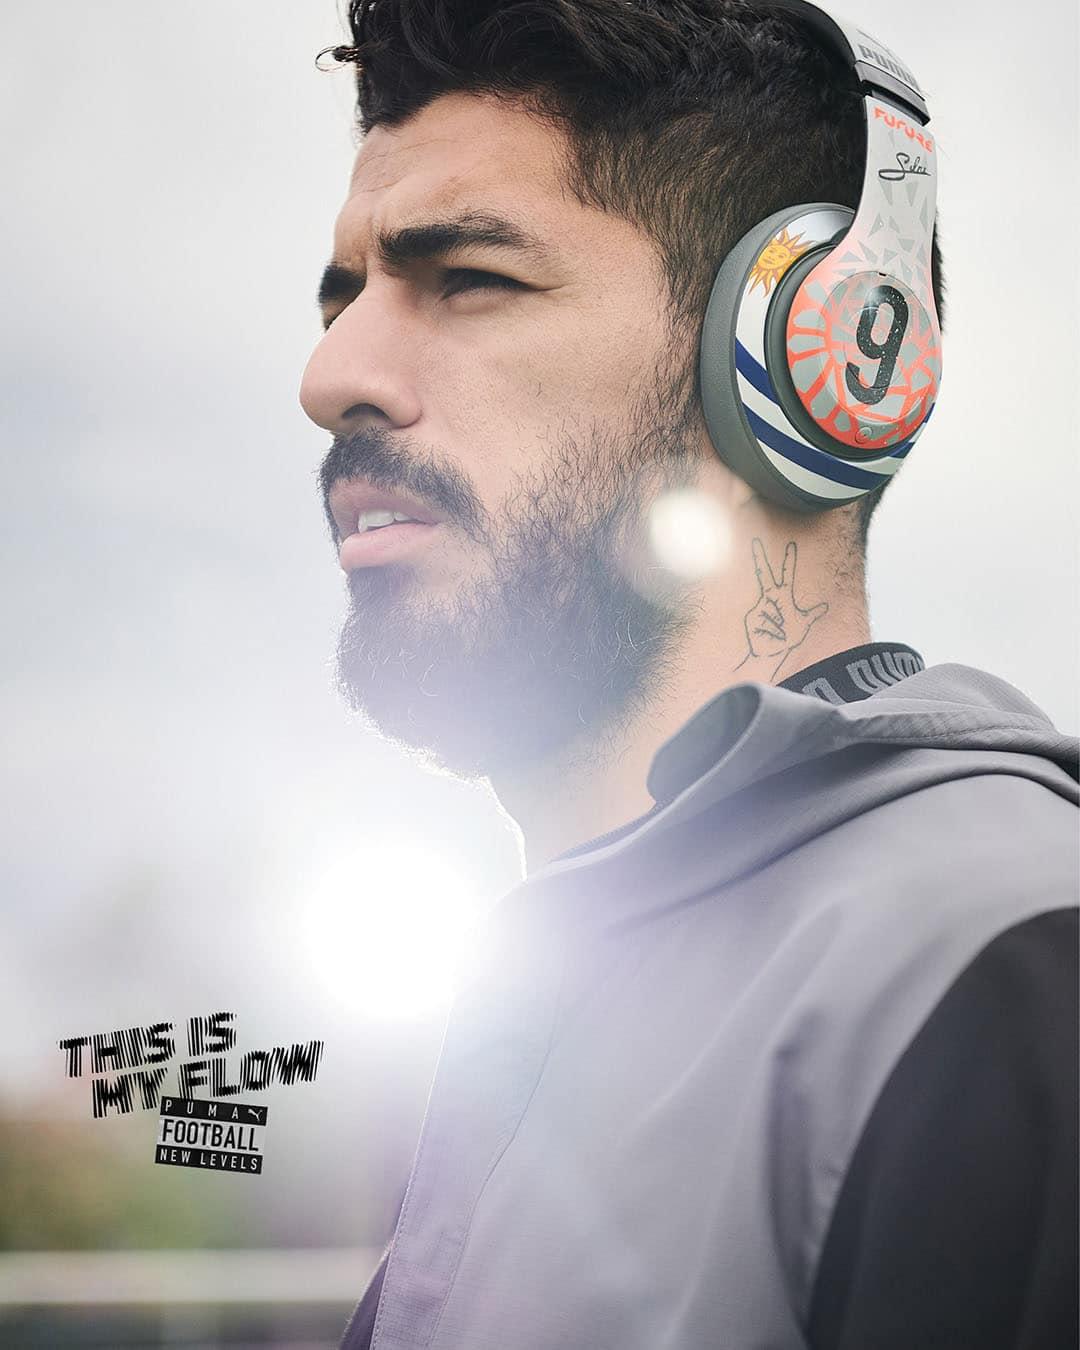 5b5d3e3e2 The Puma FUTURE Anthem Pack will be worn on pitch by Antoine Griezmann, Luis  Suarez, Marco Reus, Samuel Umtiti and Jan Oblak, while Romelu Lukaku, ...